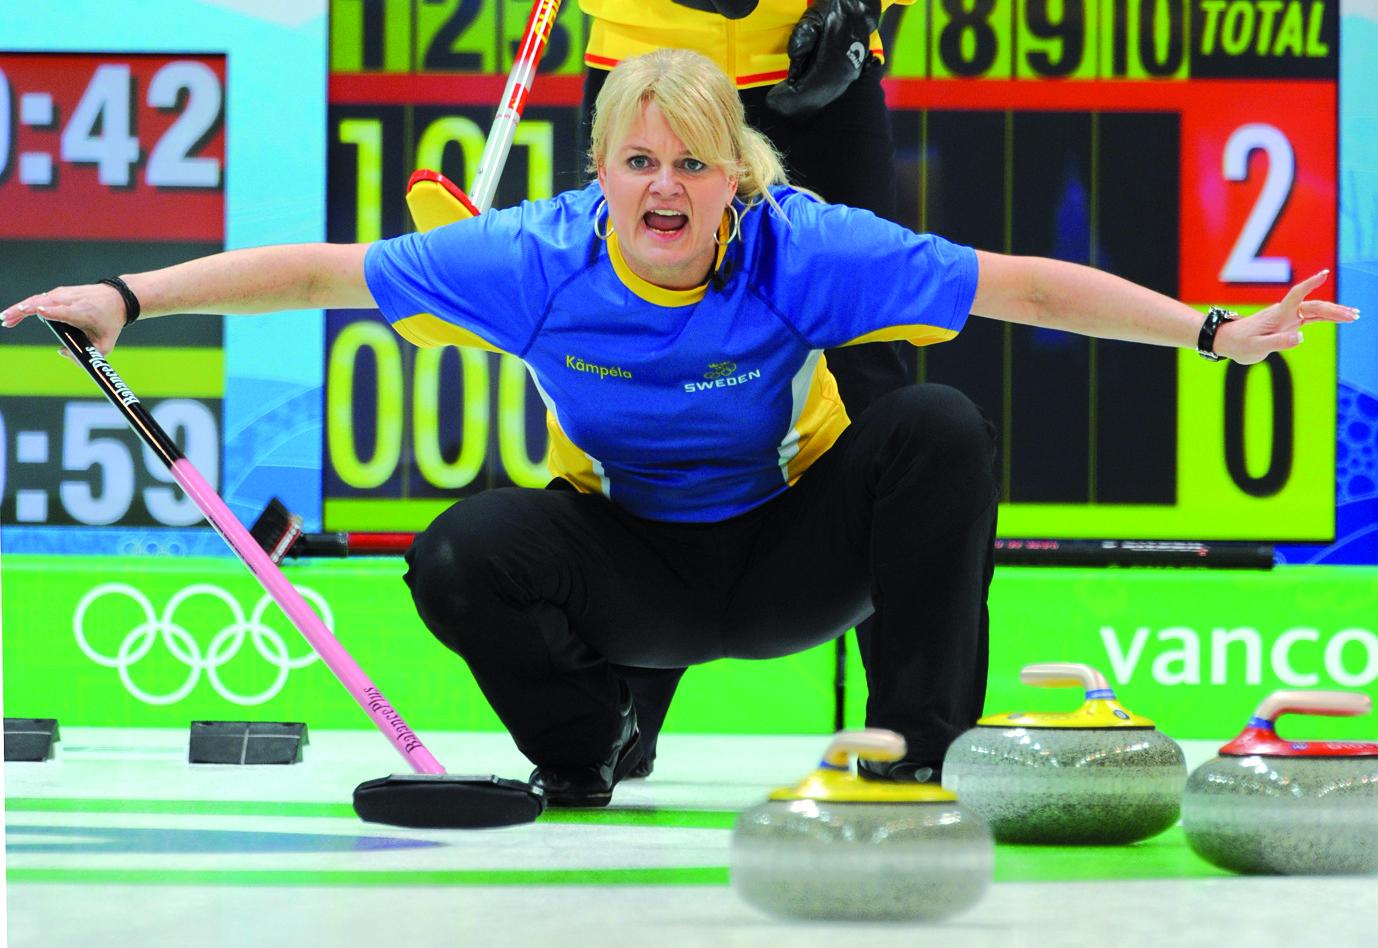 Anette Norberg vad driver anette norberg på och utanför isen? | jessica